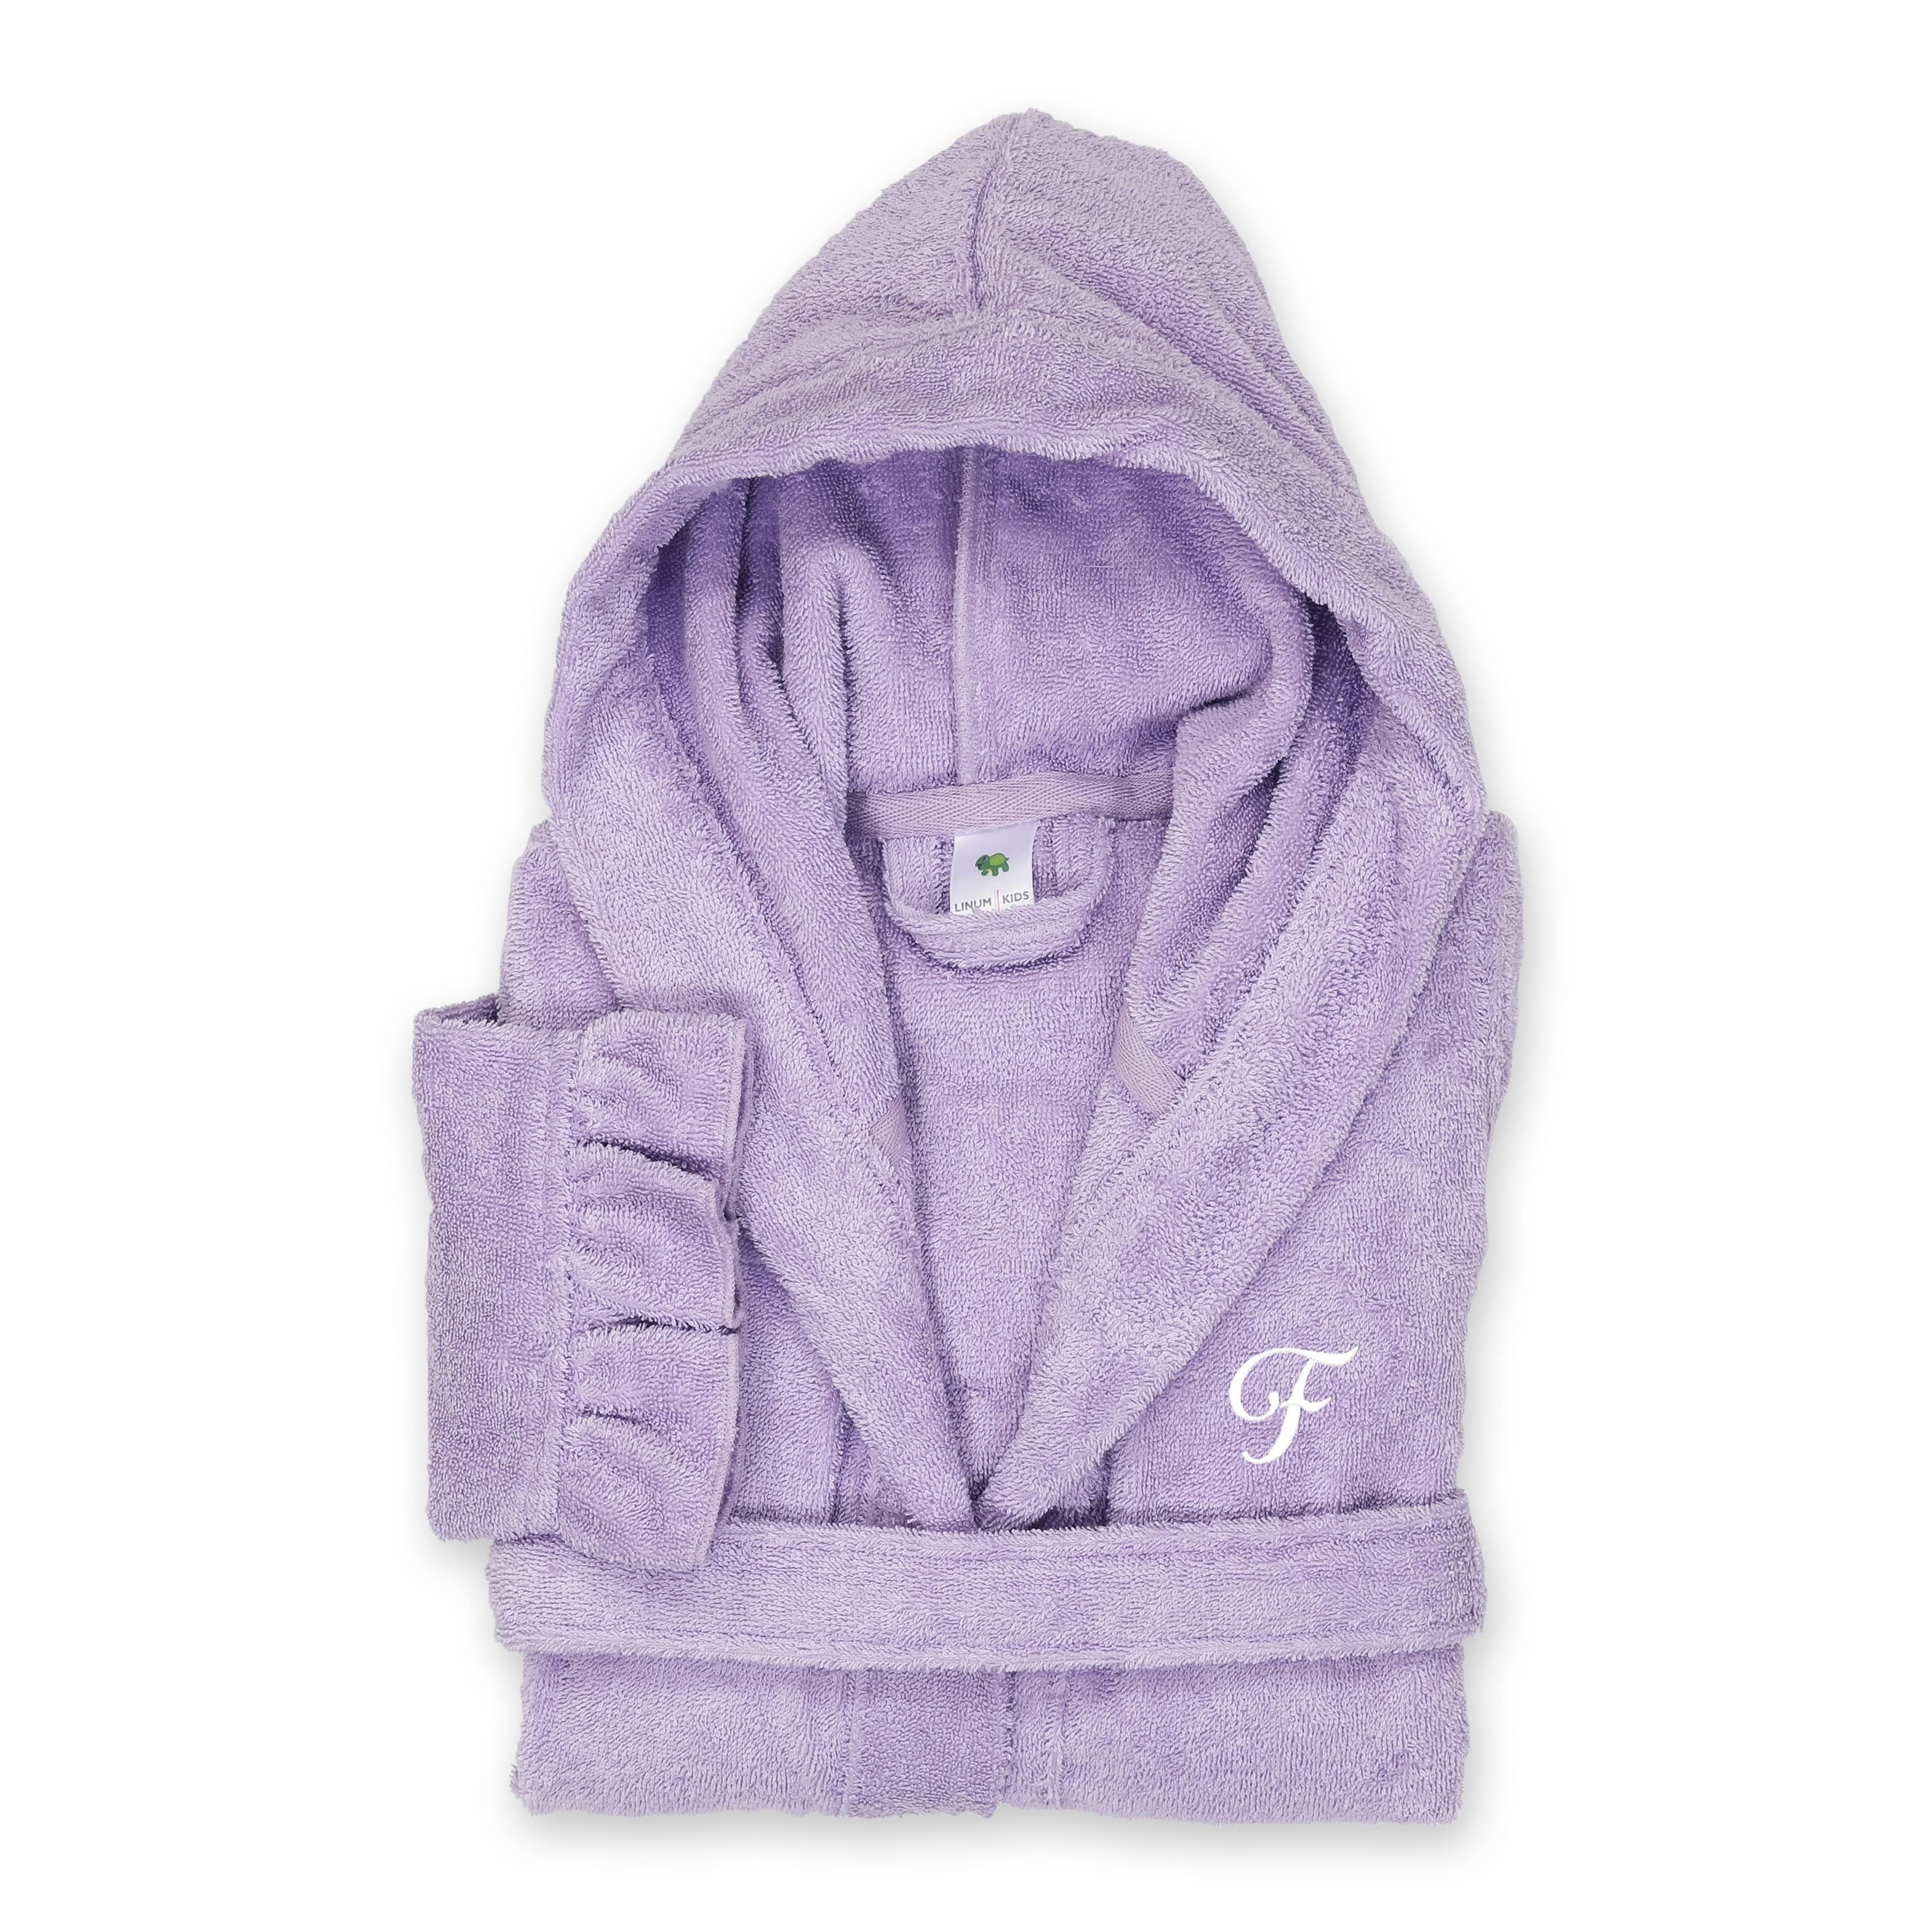 Hooded Herringbone Girls Fleece Pink Soft Spa Kimono Long Robe,Kids Comfy Sleepwear Bathrobe